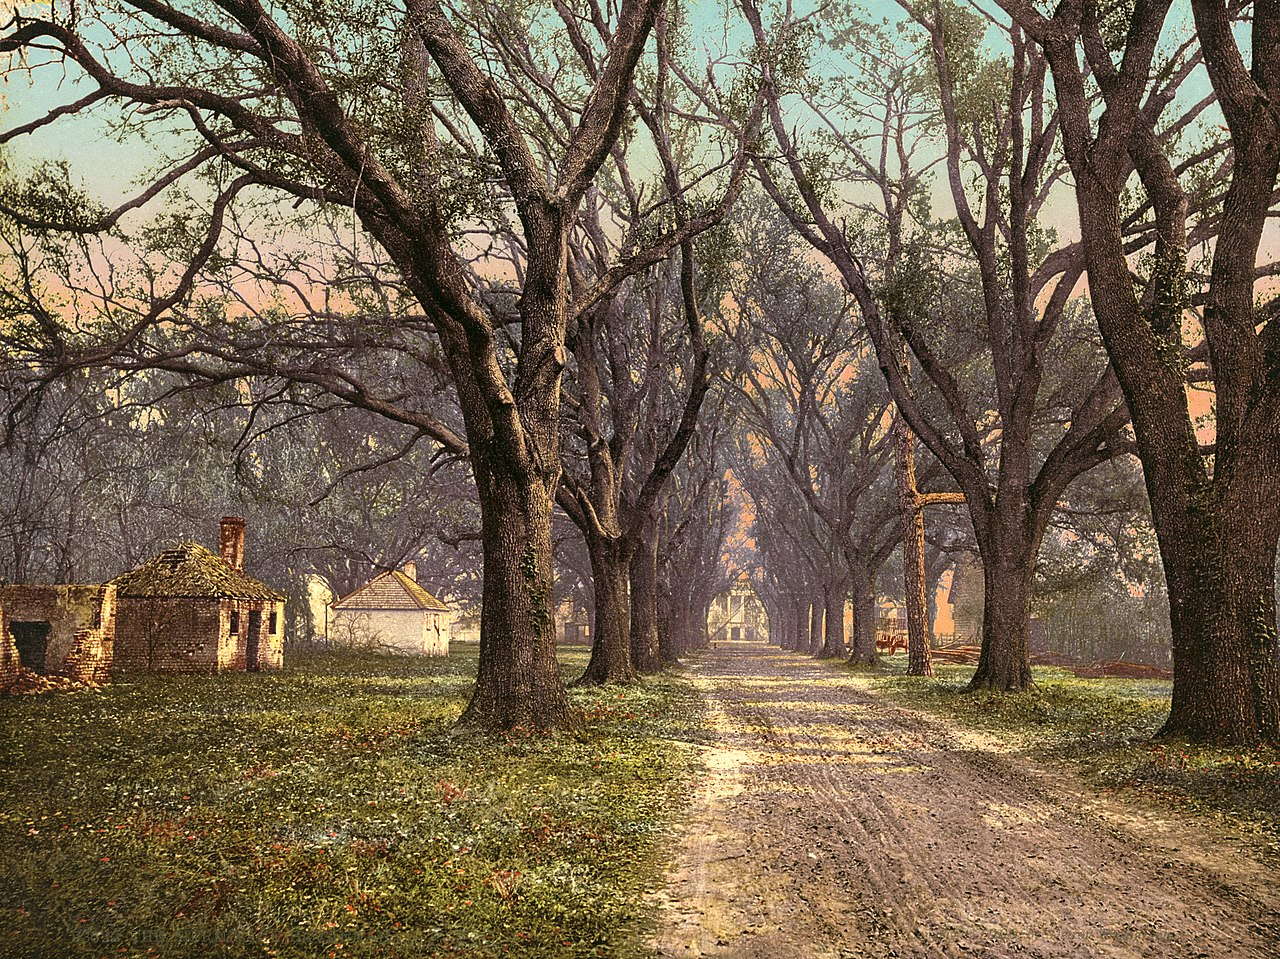 File:The Hermitage plantation, Savannah, Georgia, 1900.jpg ...